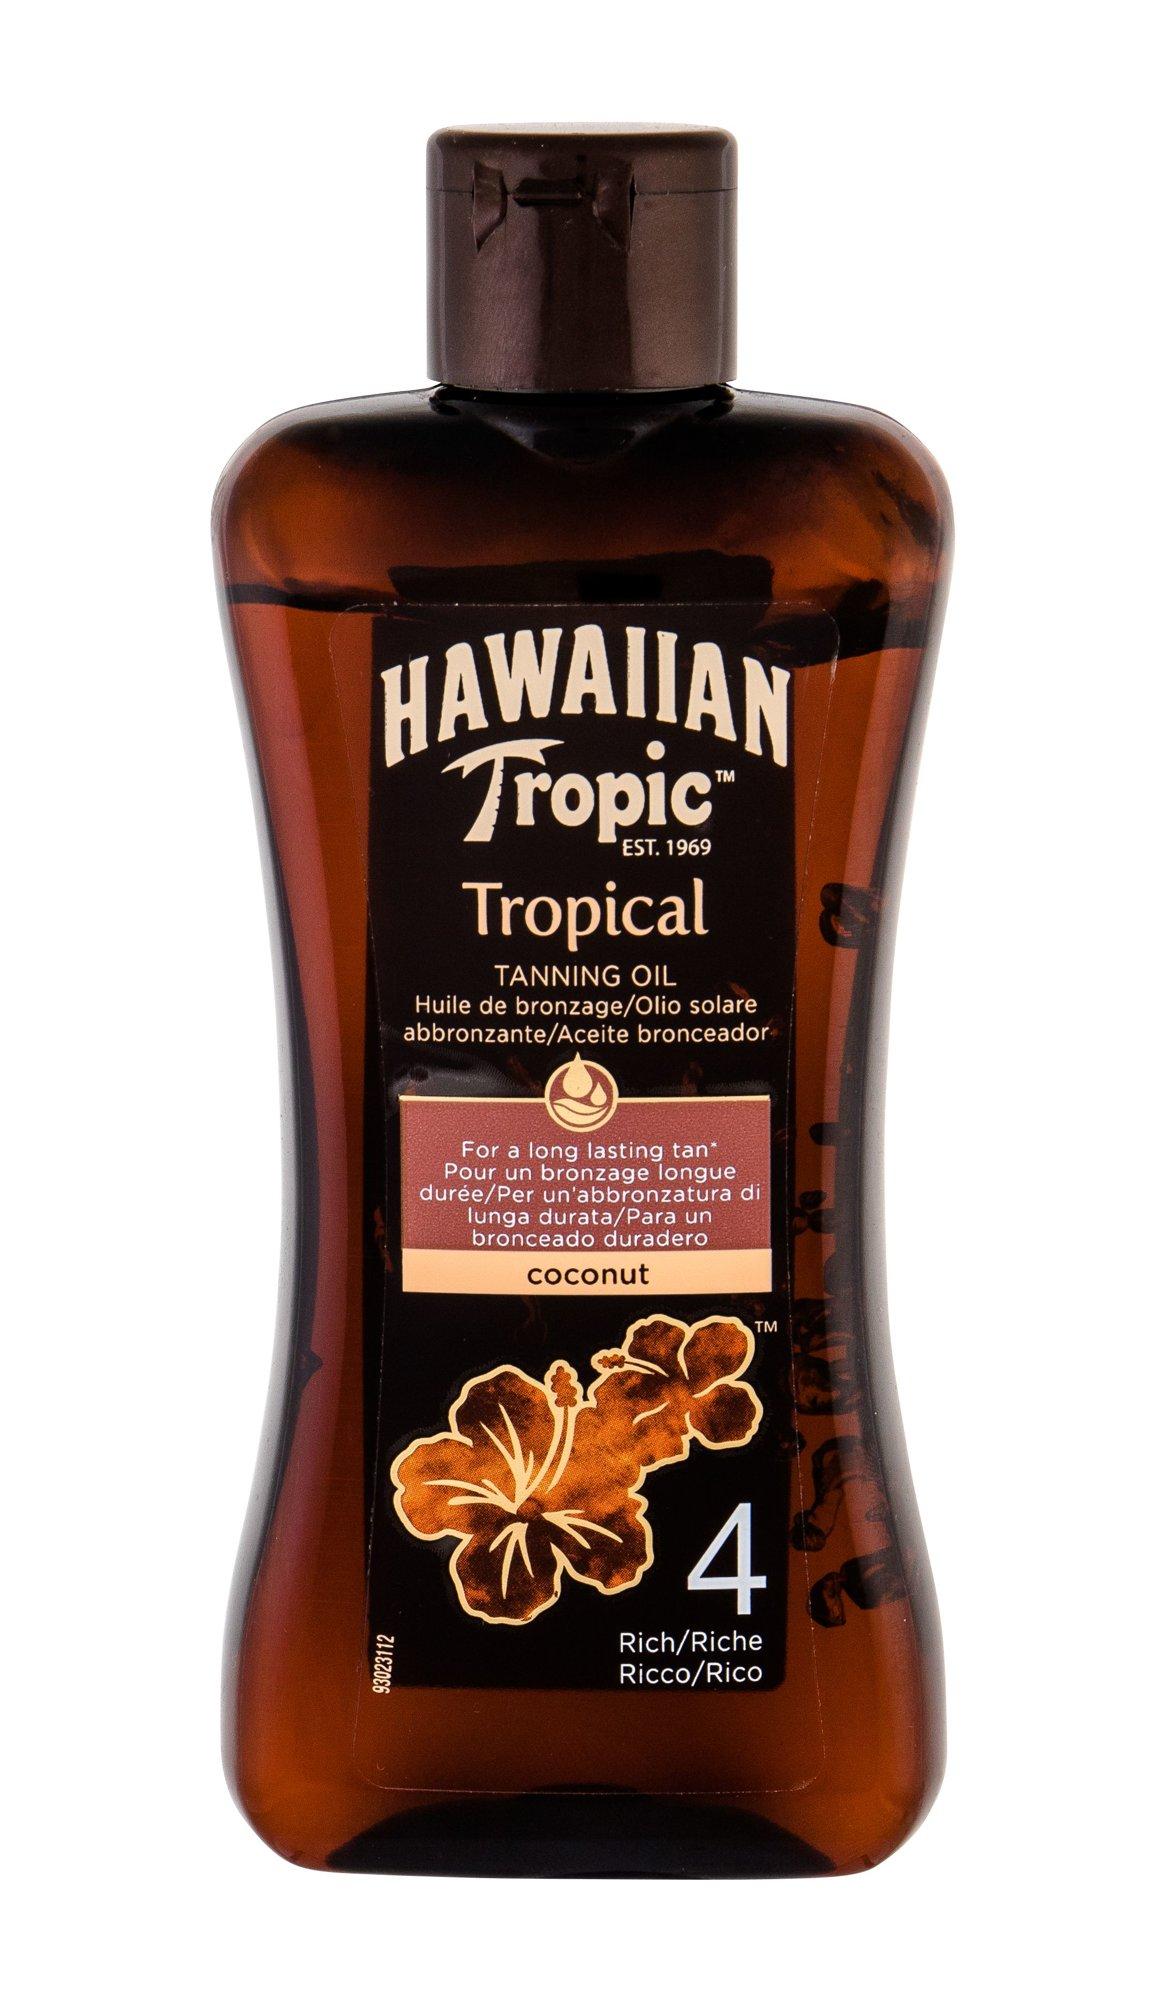 Hawaiian Tropic Tropical Tanning Oil After Sun Care 200ml